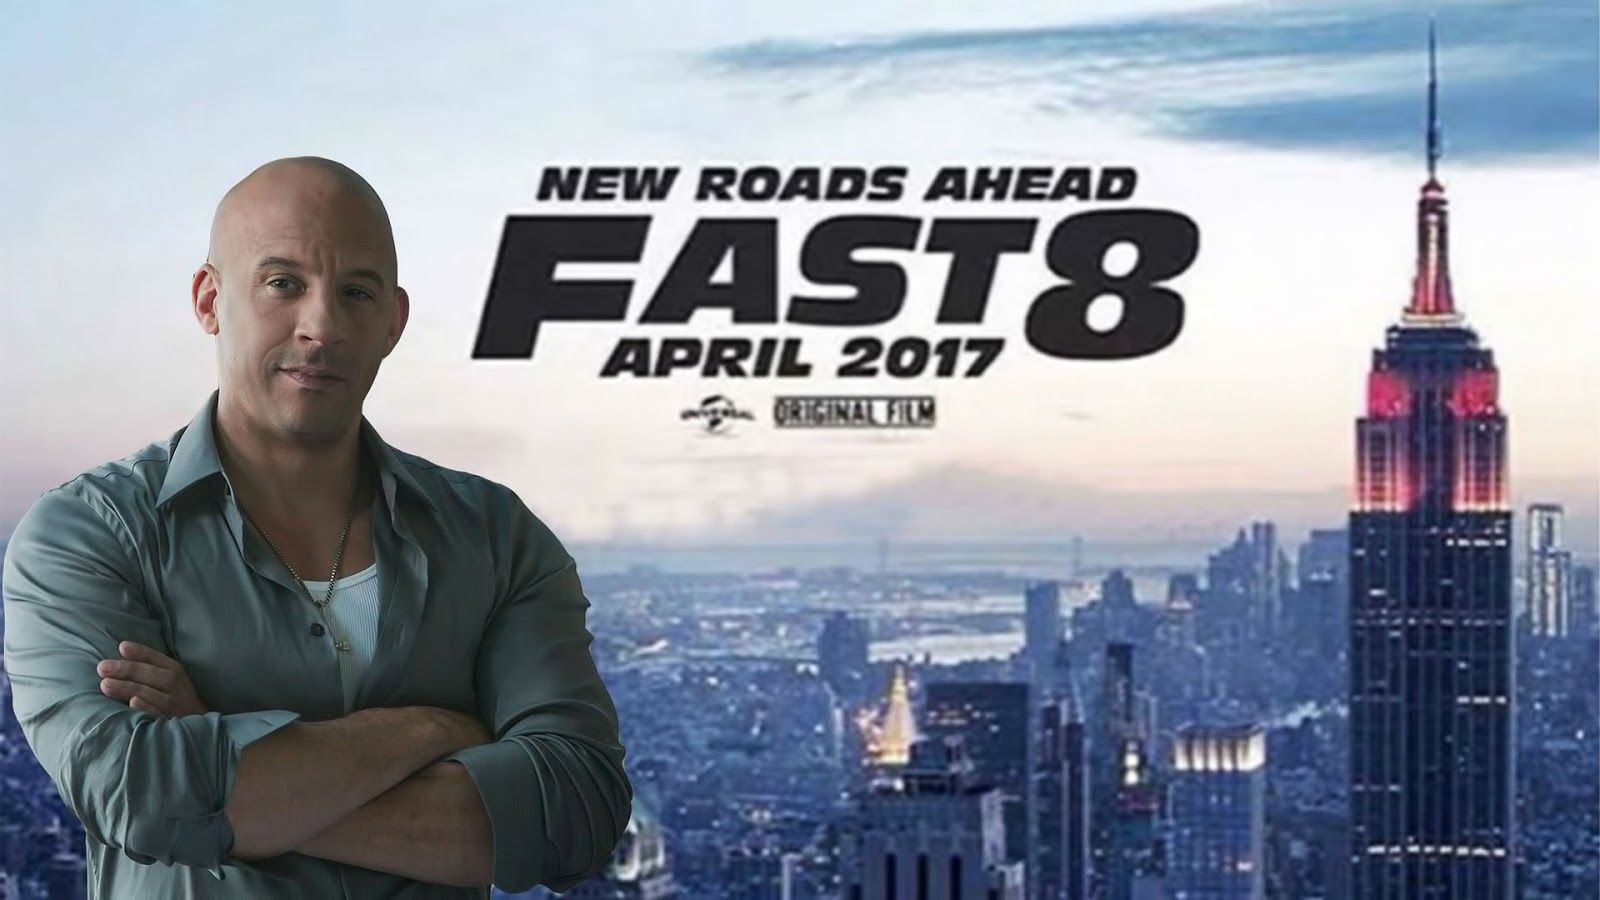 Hd Filme Fast And Furious 8 Stream